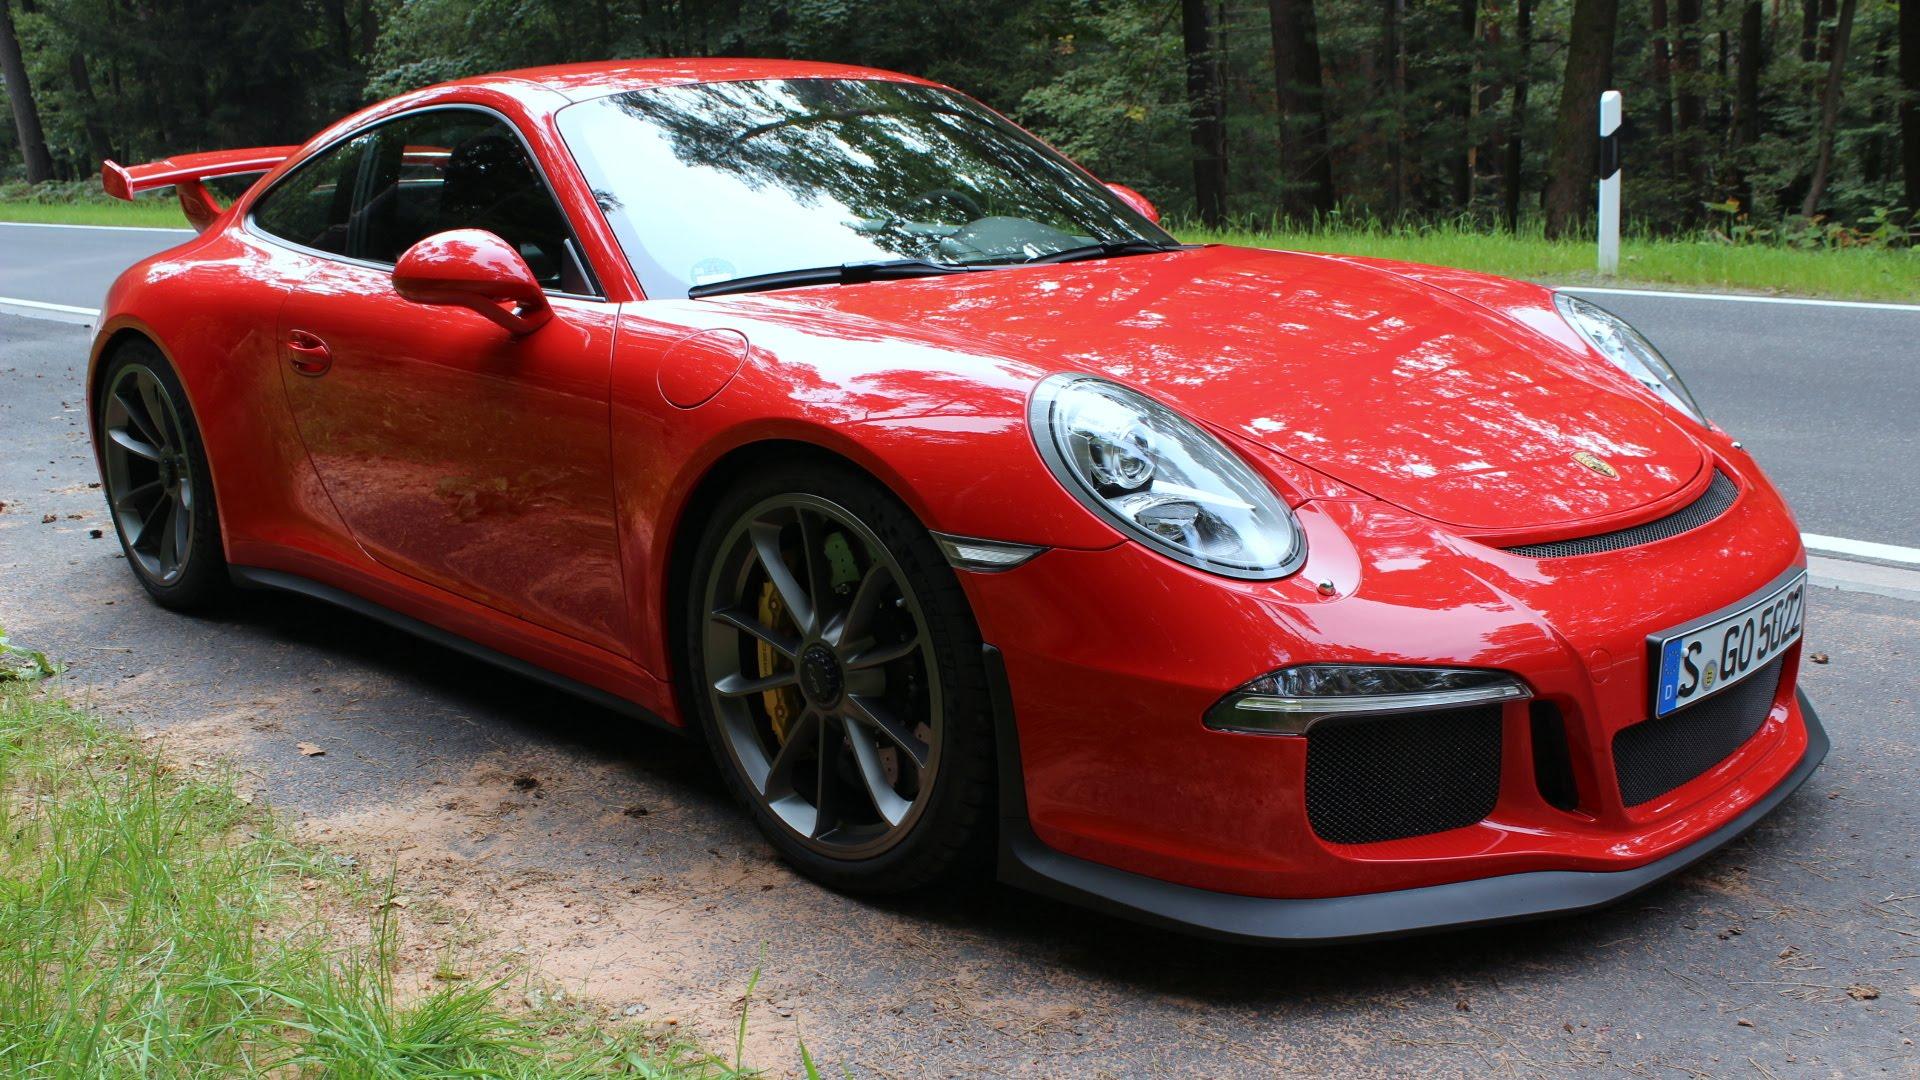 2014 / 2015 Porsche 911 GT3 (991) ' Test Drive & Review - TheGetawayer